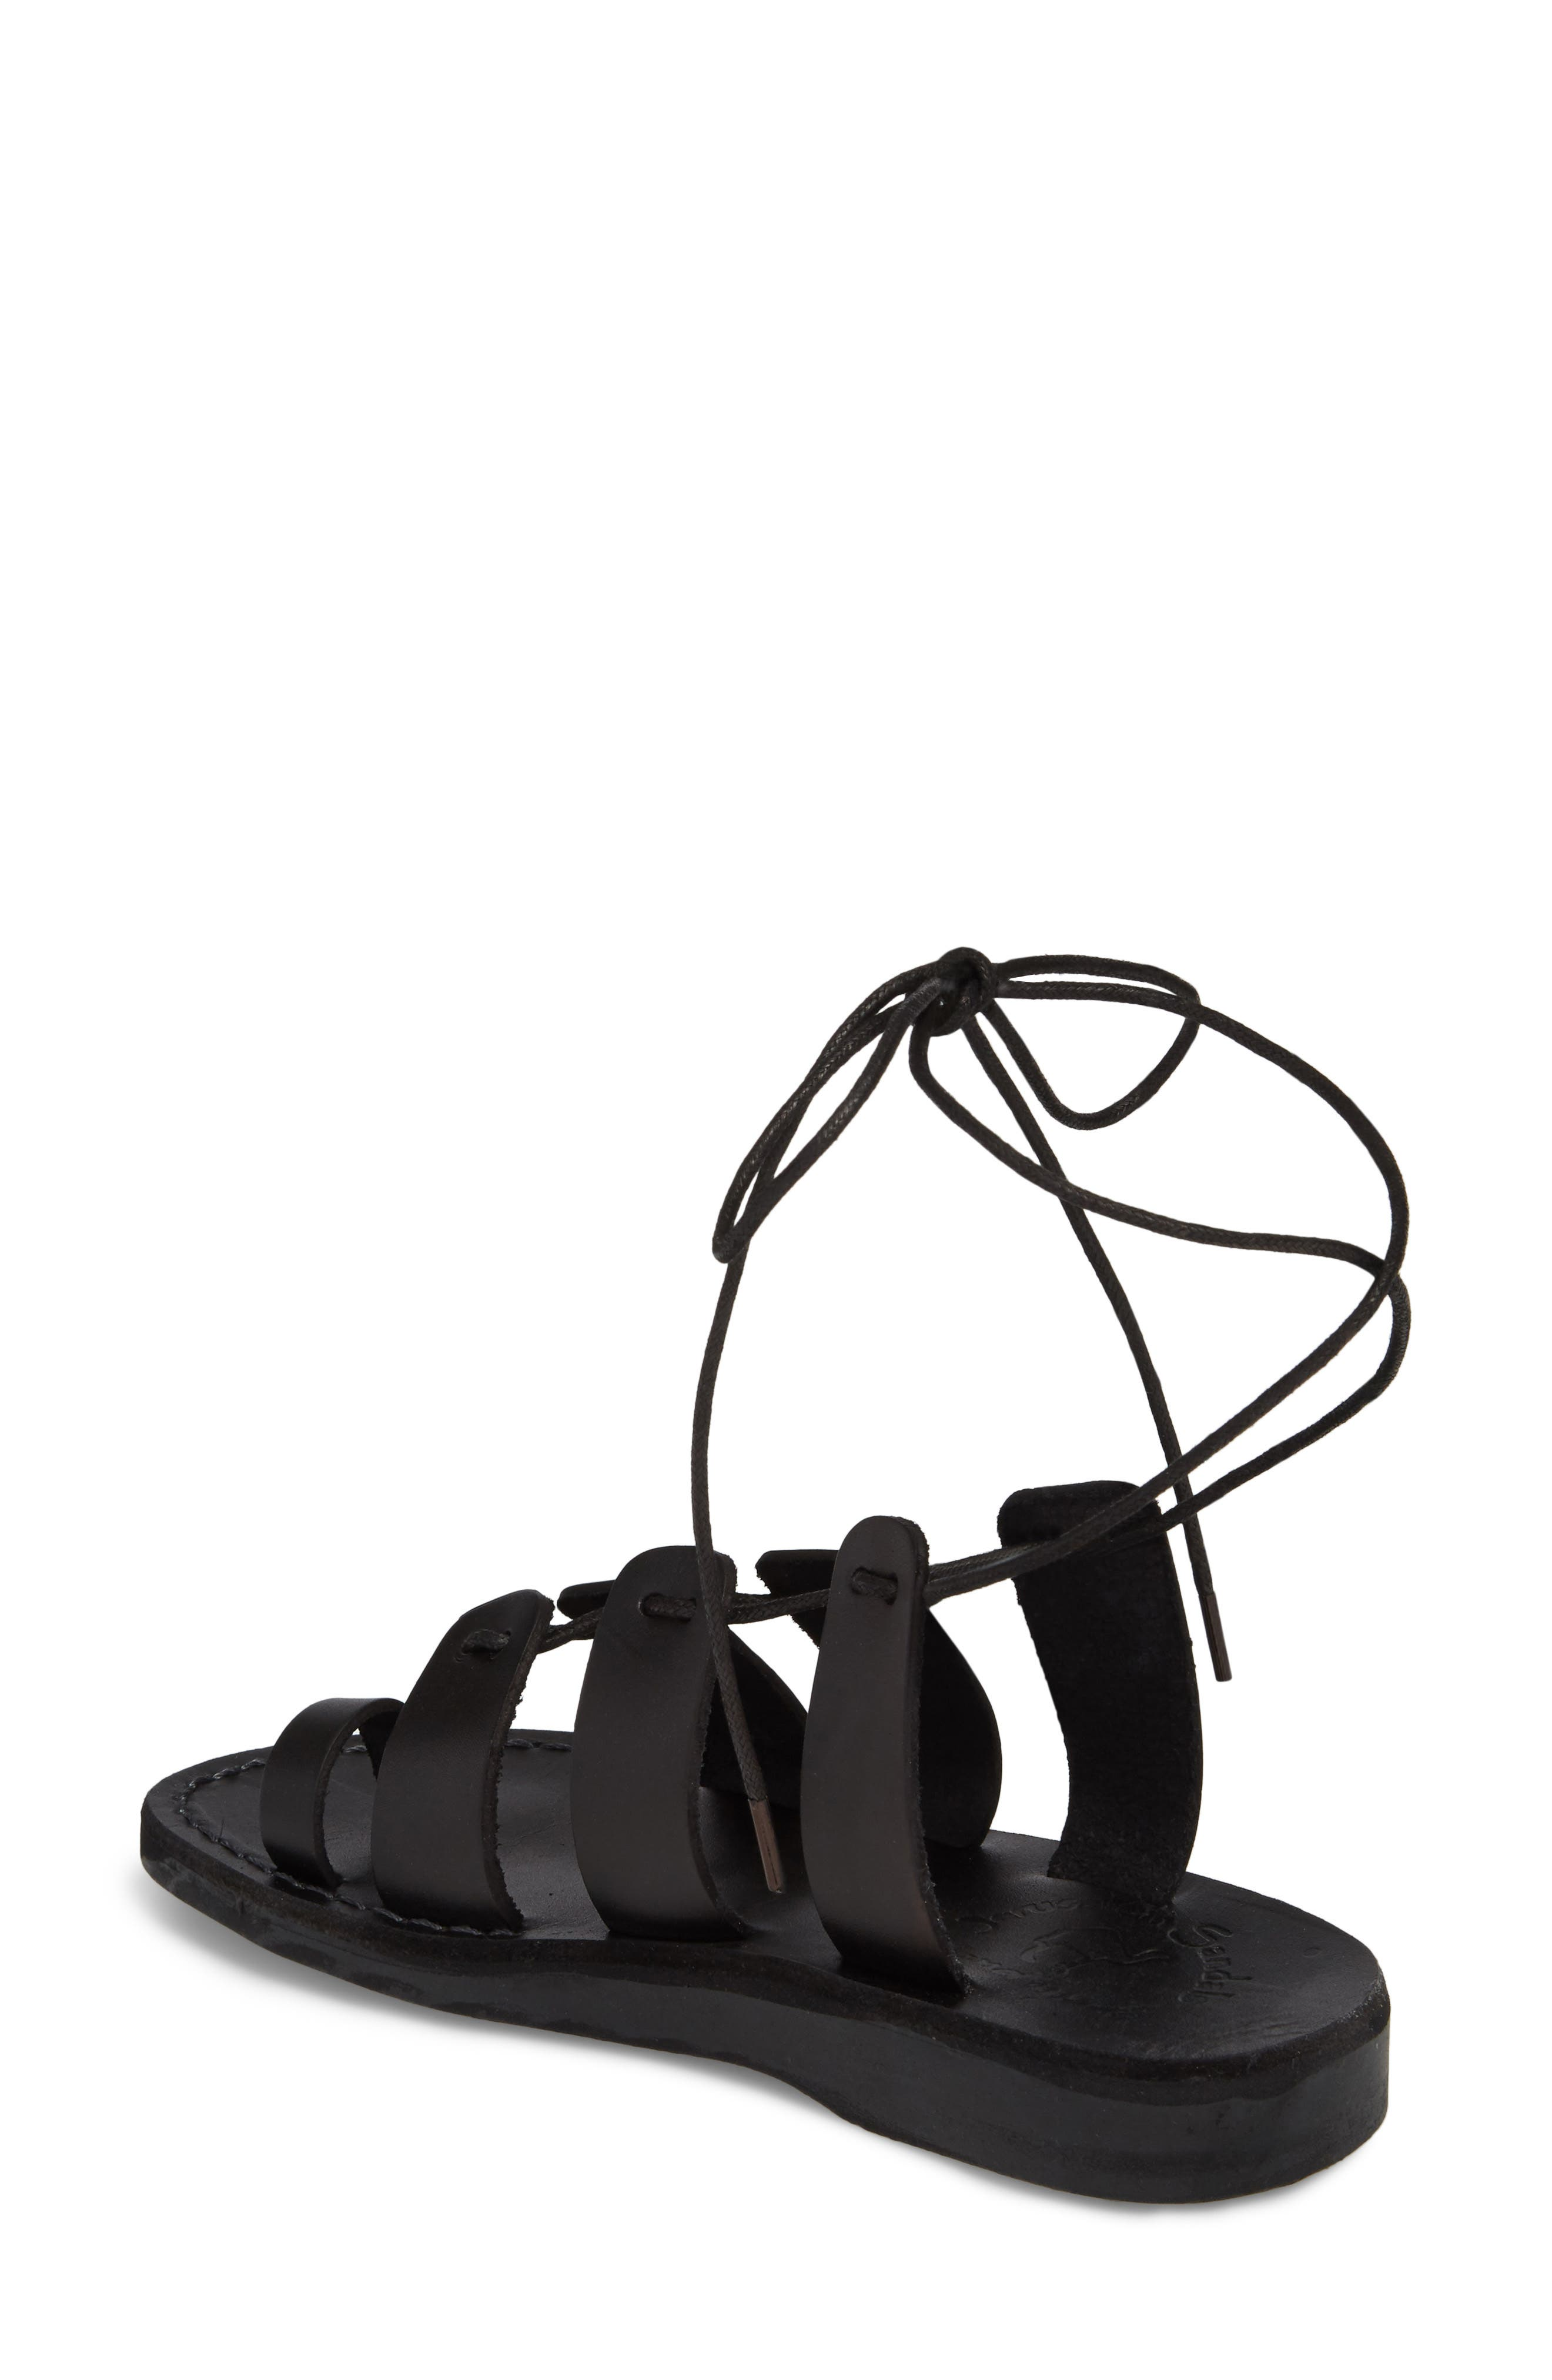 Deborah Wraparound Laces Sandal,                             Alternate thumbnail 2, color,                             BLACK LEATHER